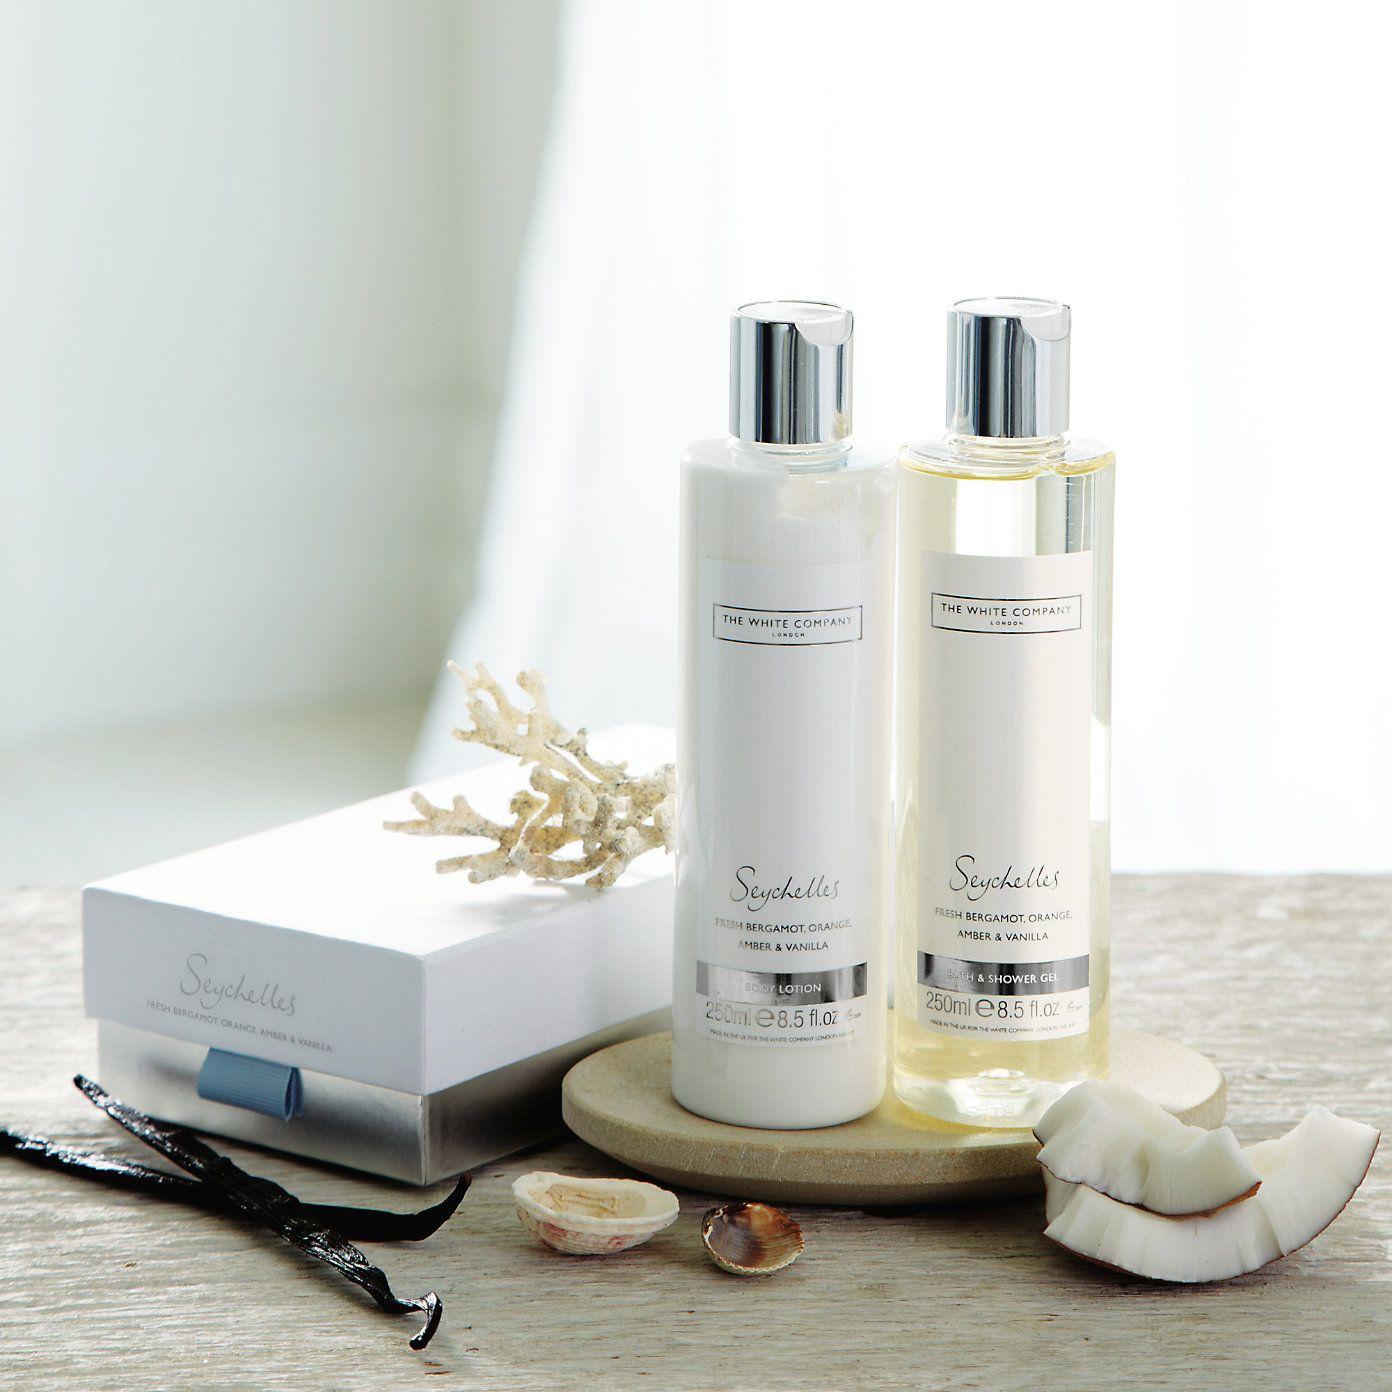 Seychelles Bath & Body Gift Set Bath & Body The White